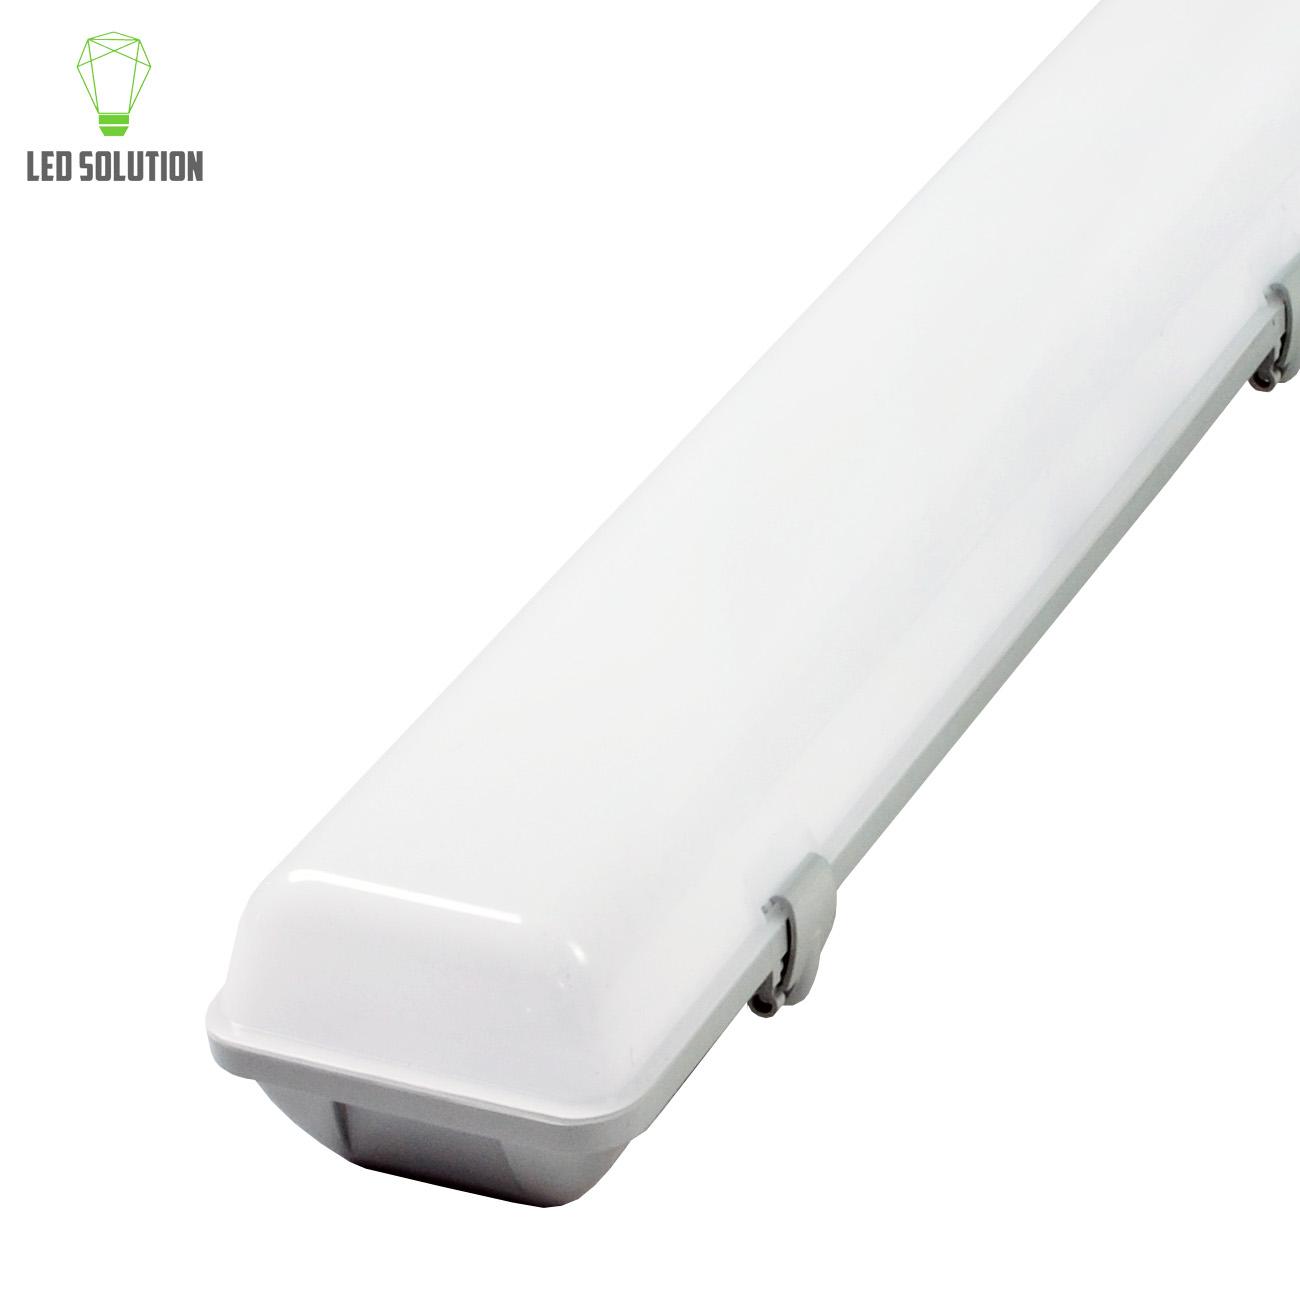 Ecolite LED žiarivkové teleso 150cm 80W Premium TL3903A-LED80W